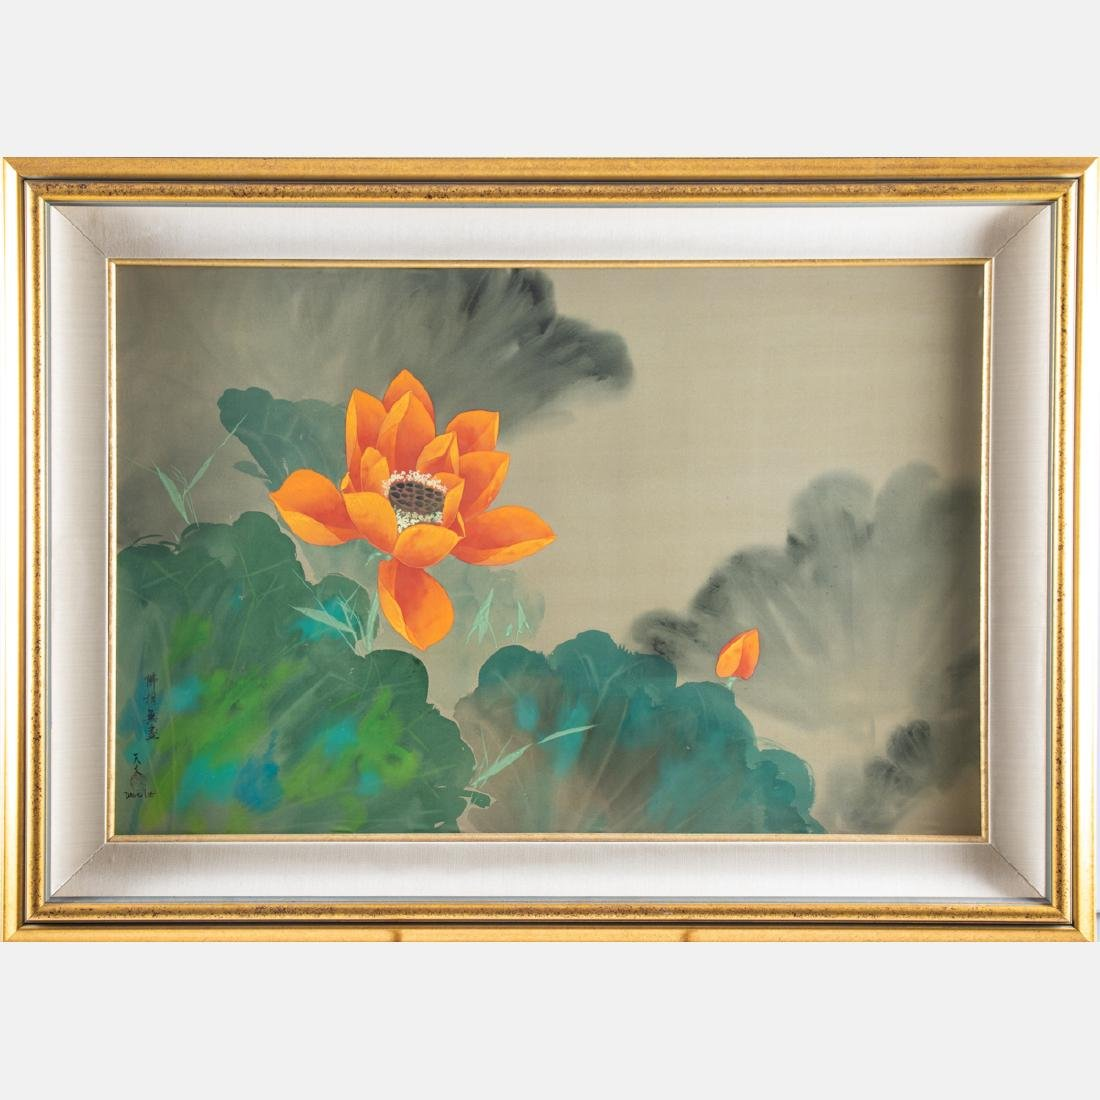 David Lee (Chinese, b. 1944) Orange Blossom, Oil on - 2